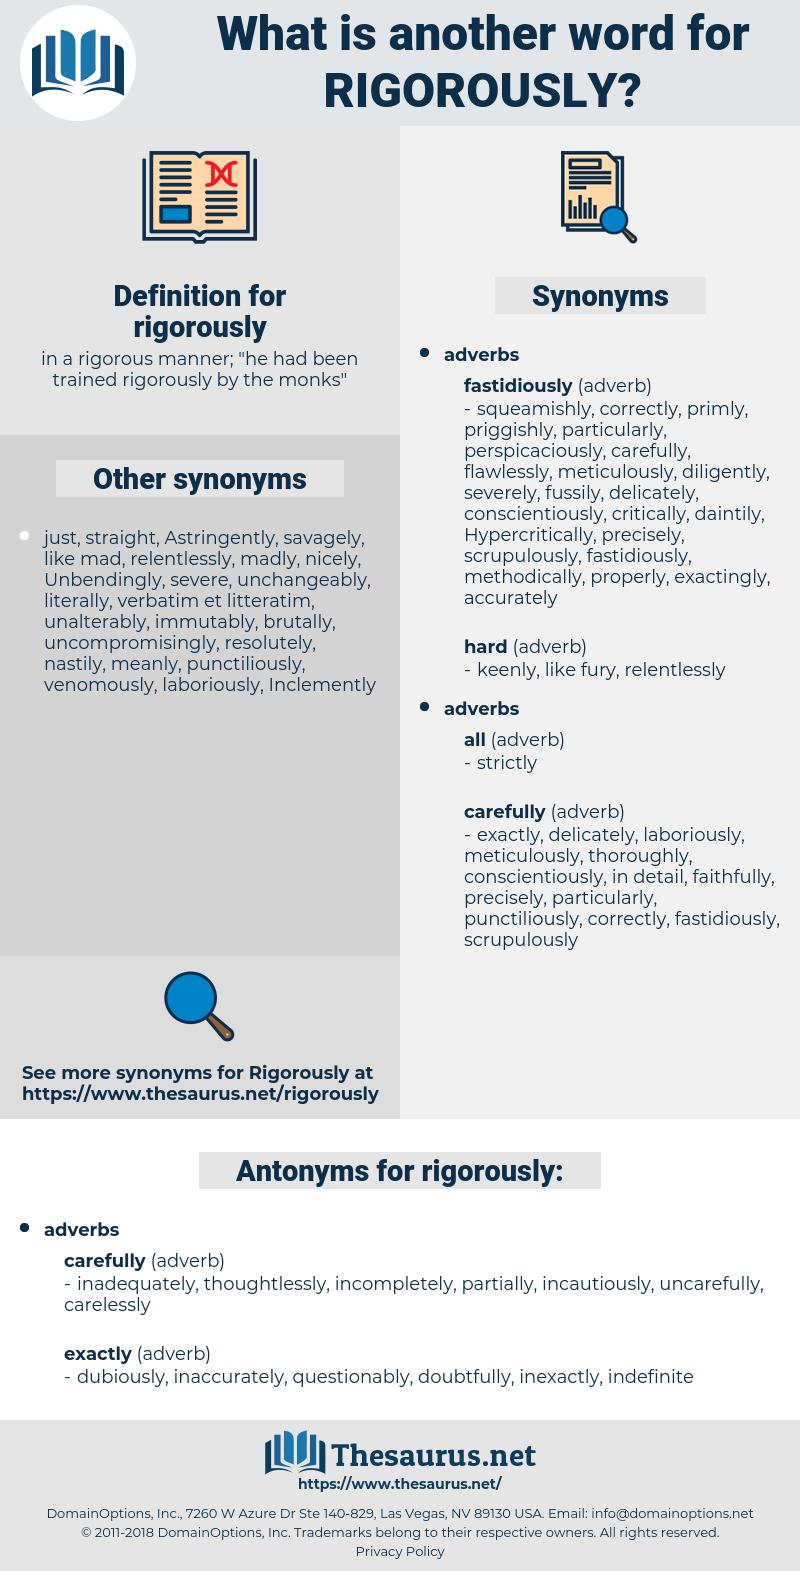 rigorously, synonym rigorously, another word for rigorously, words like rigorously, thesaurus rigorously